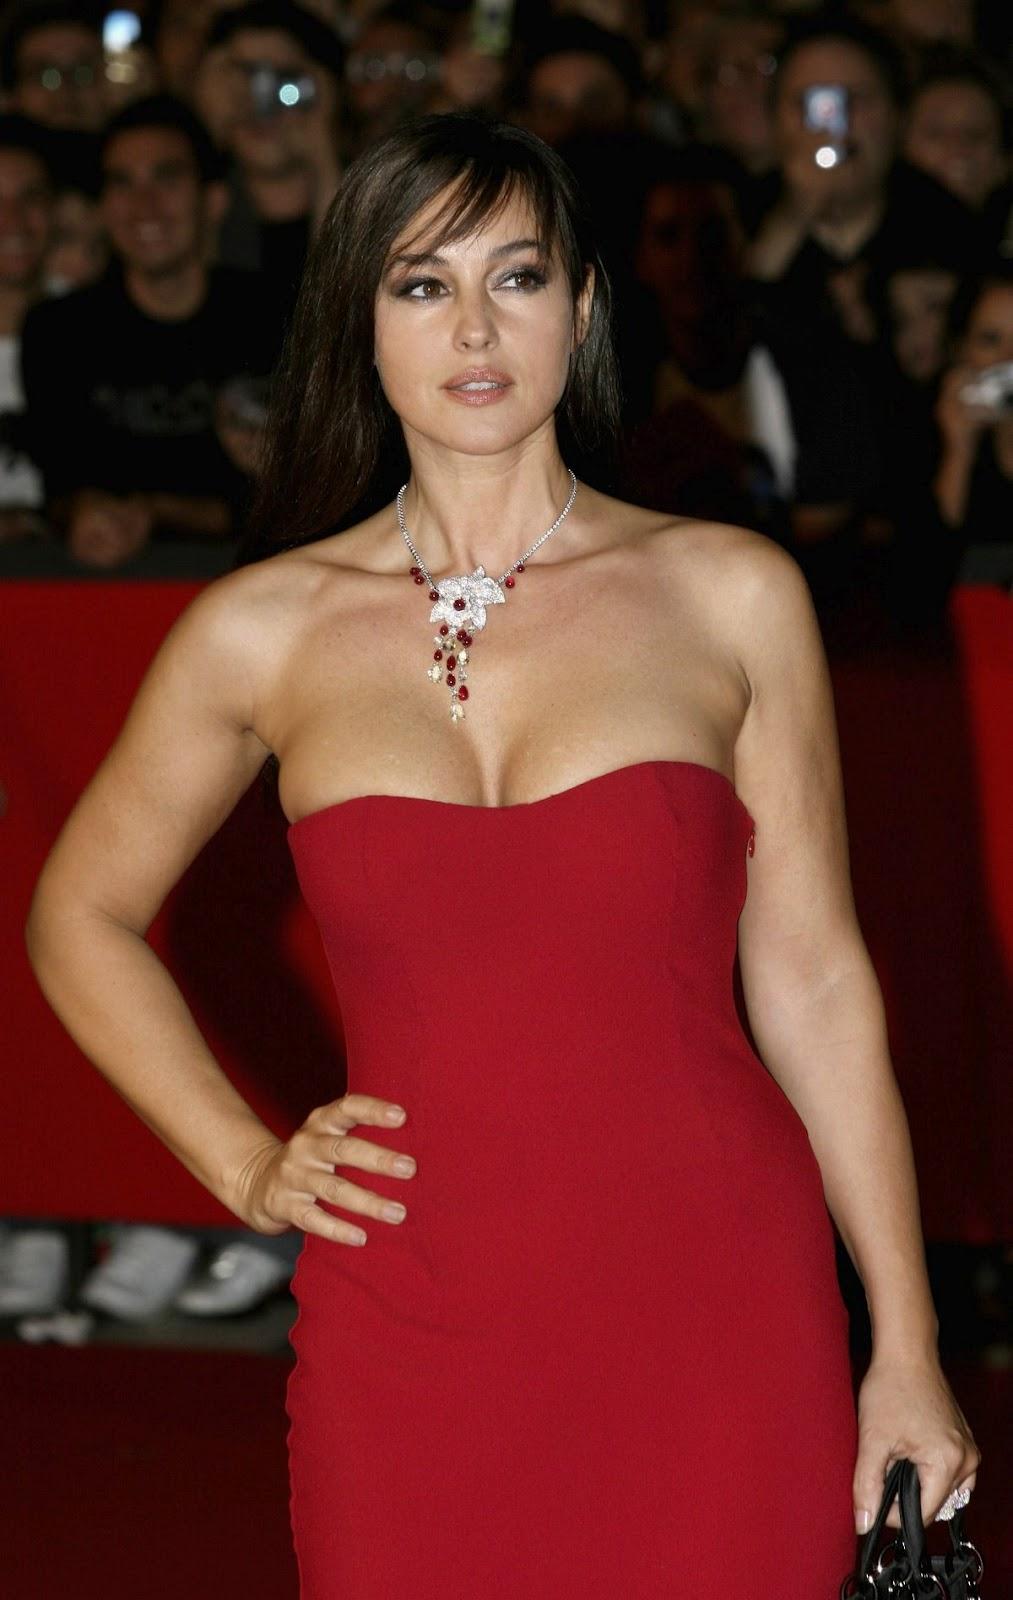 Celebrity Bra Sizes and Celebrity Measurements